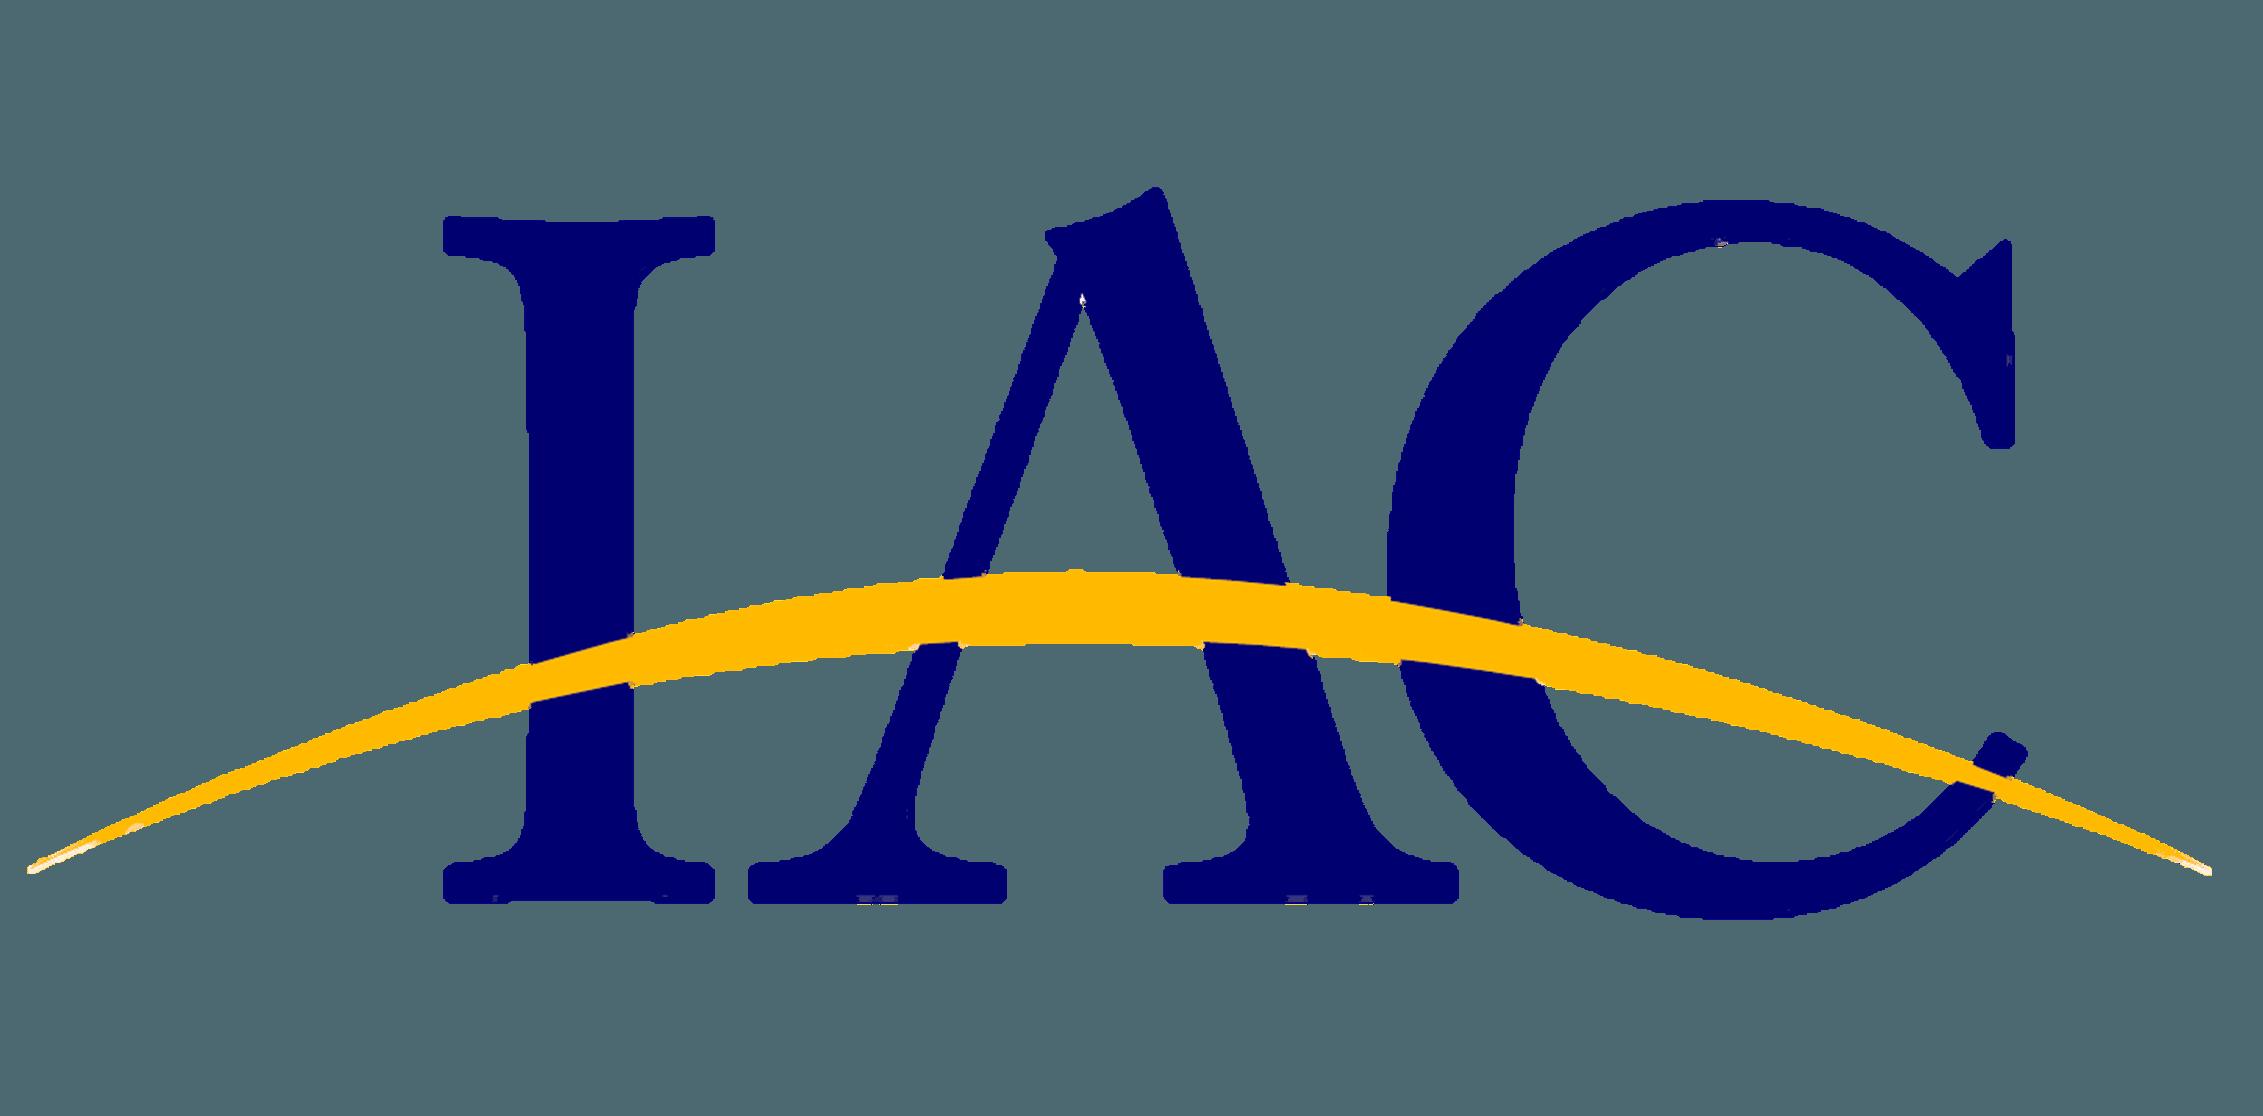 iac vimeo platform acquisition